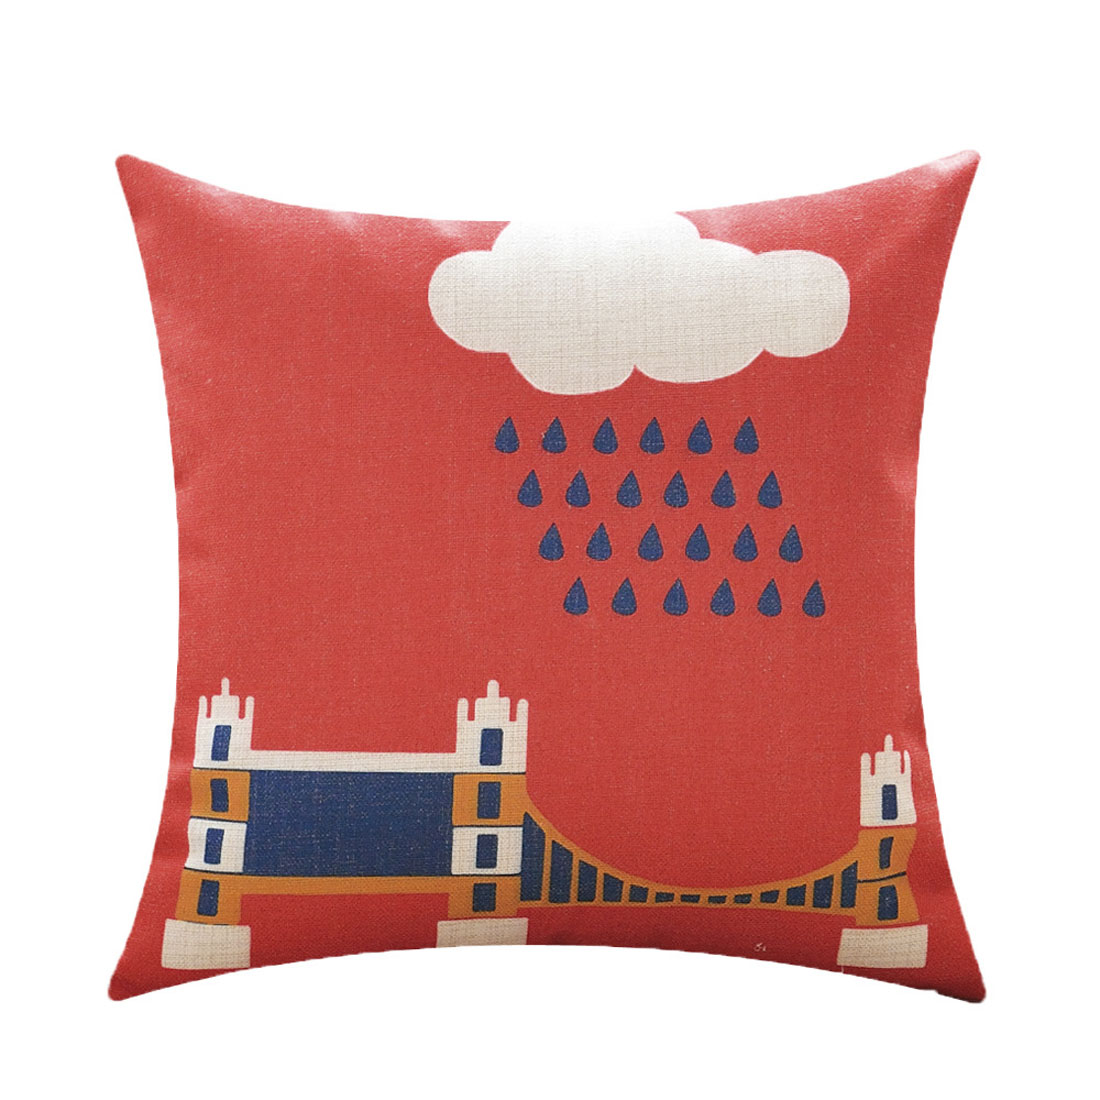 Sofa Cotton Linen London Tower Bridge Pattern Waist Throw Cushion Cover Pillow Case